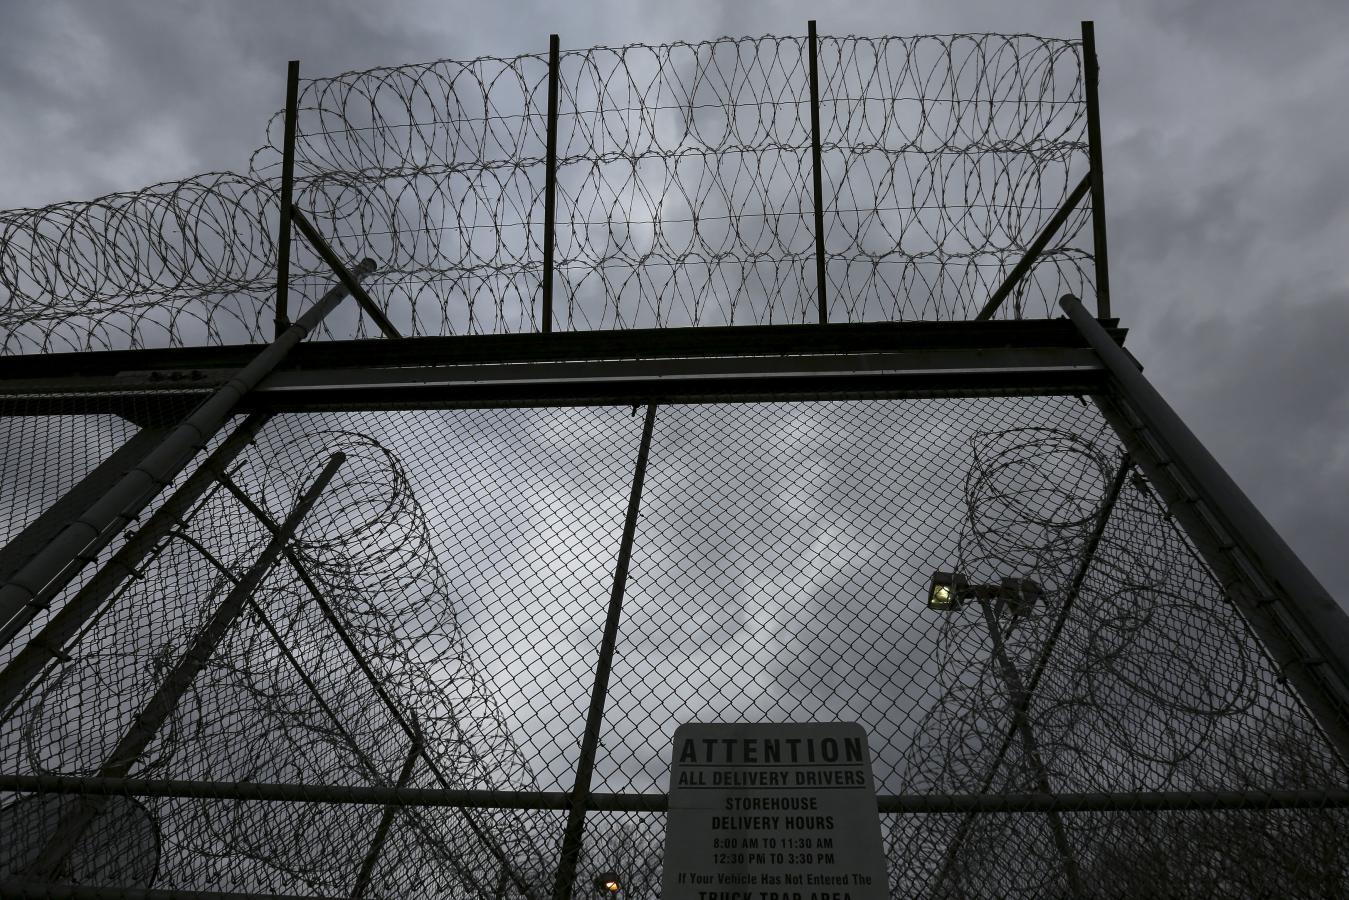 Severe criminal justice policies hurt U.S. economy: White House